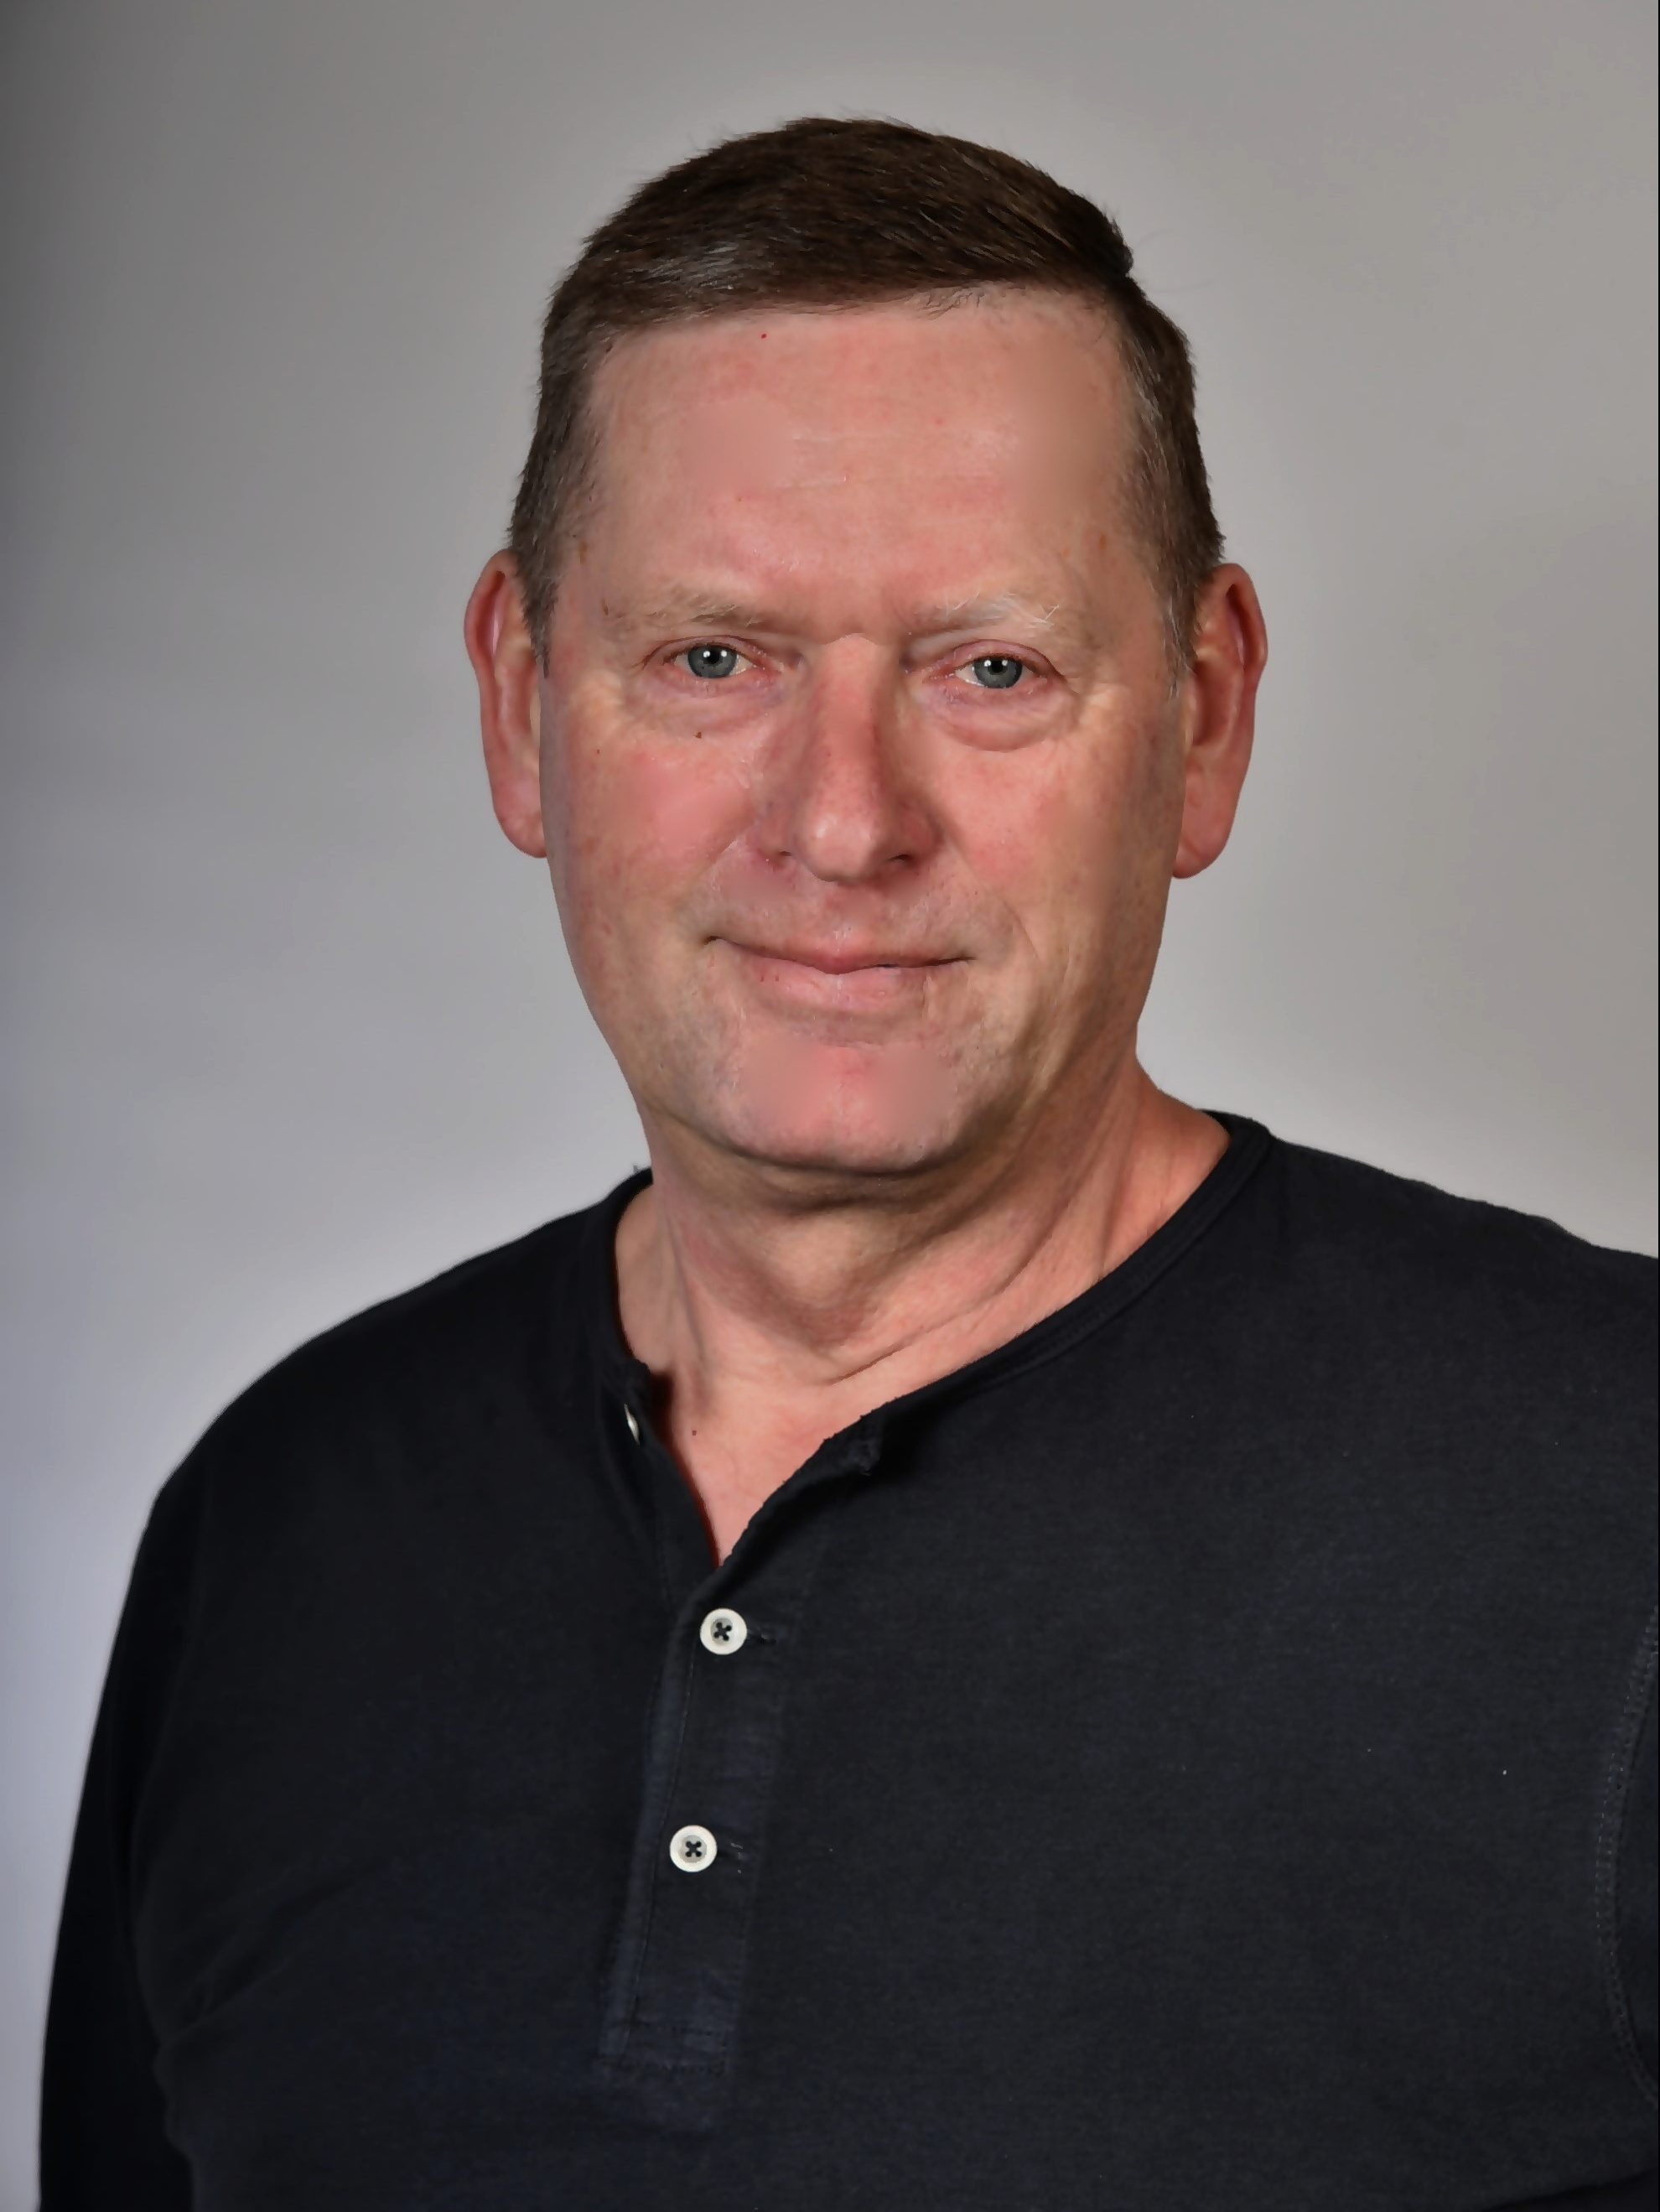 Reinhard Lossin